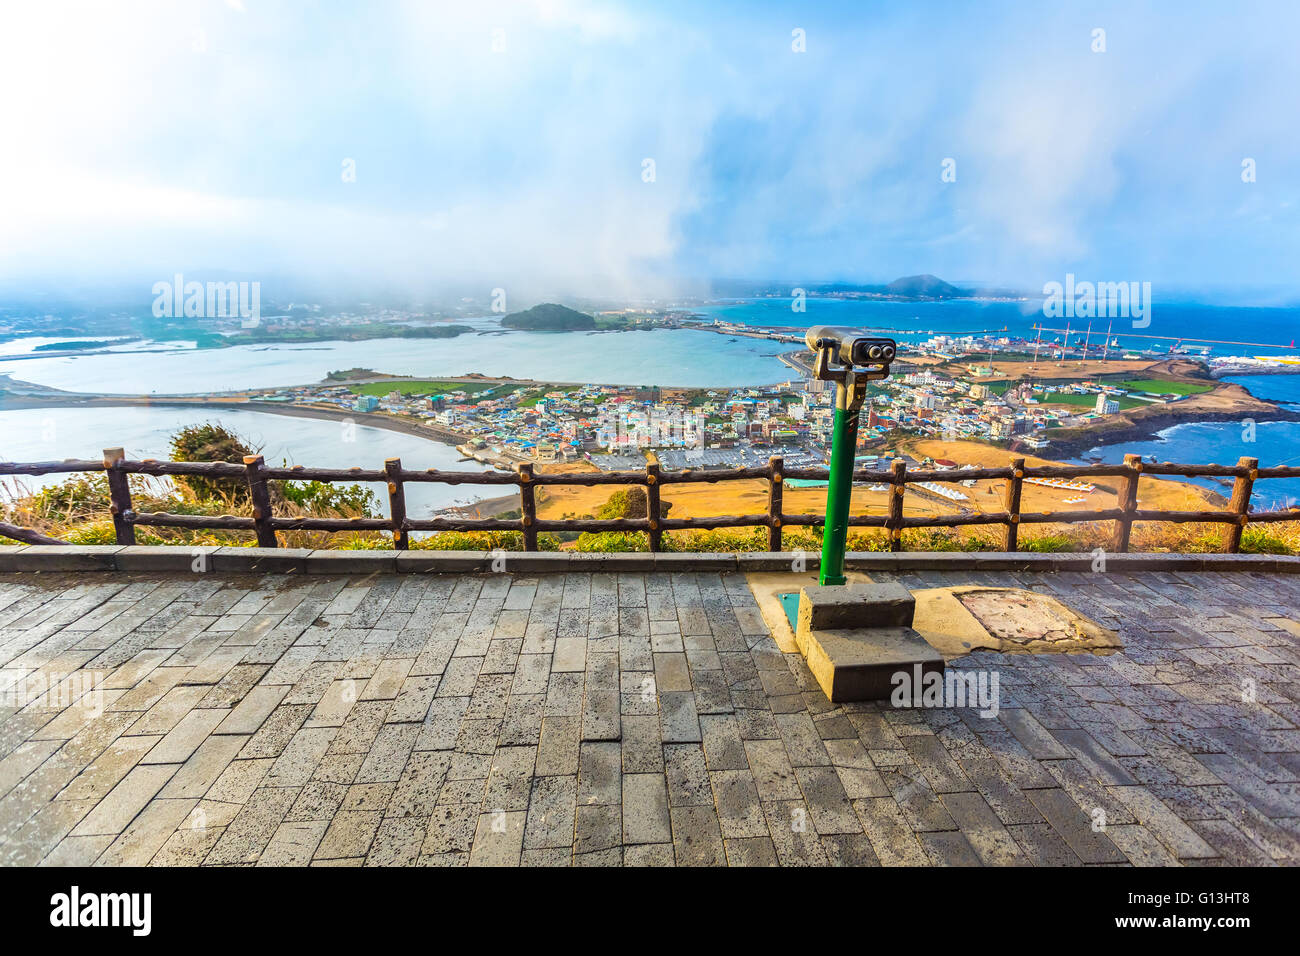 View from Seongsan Ilchulbong moutain in Jeju Island, South Korea. Stock Photo